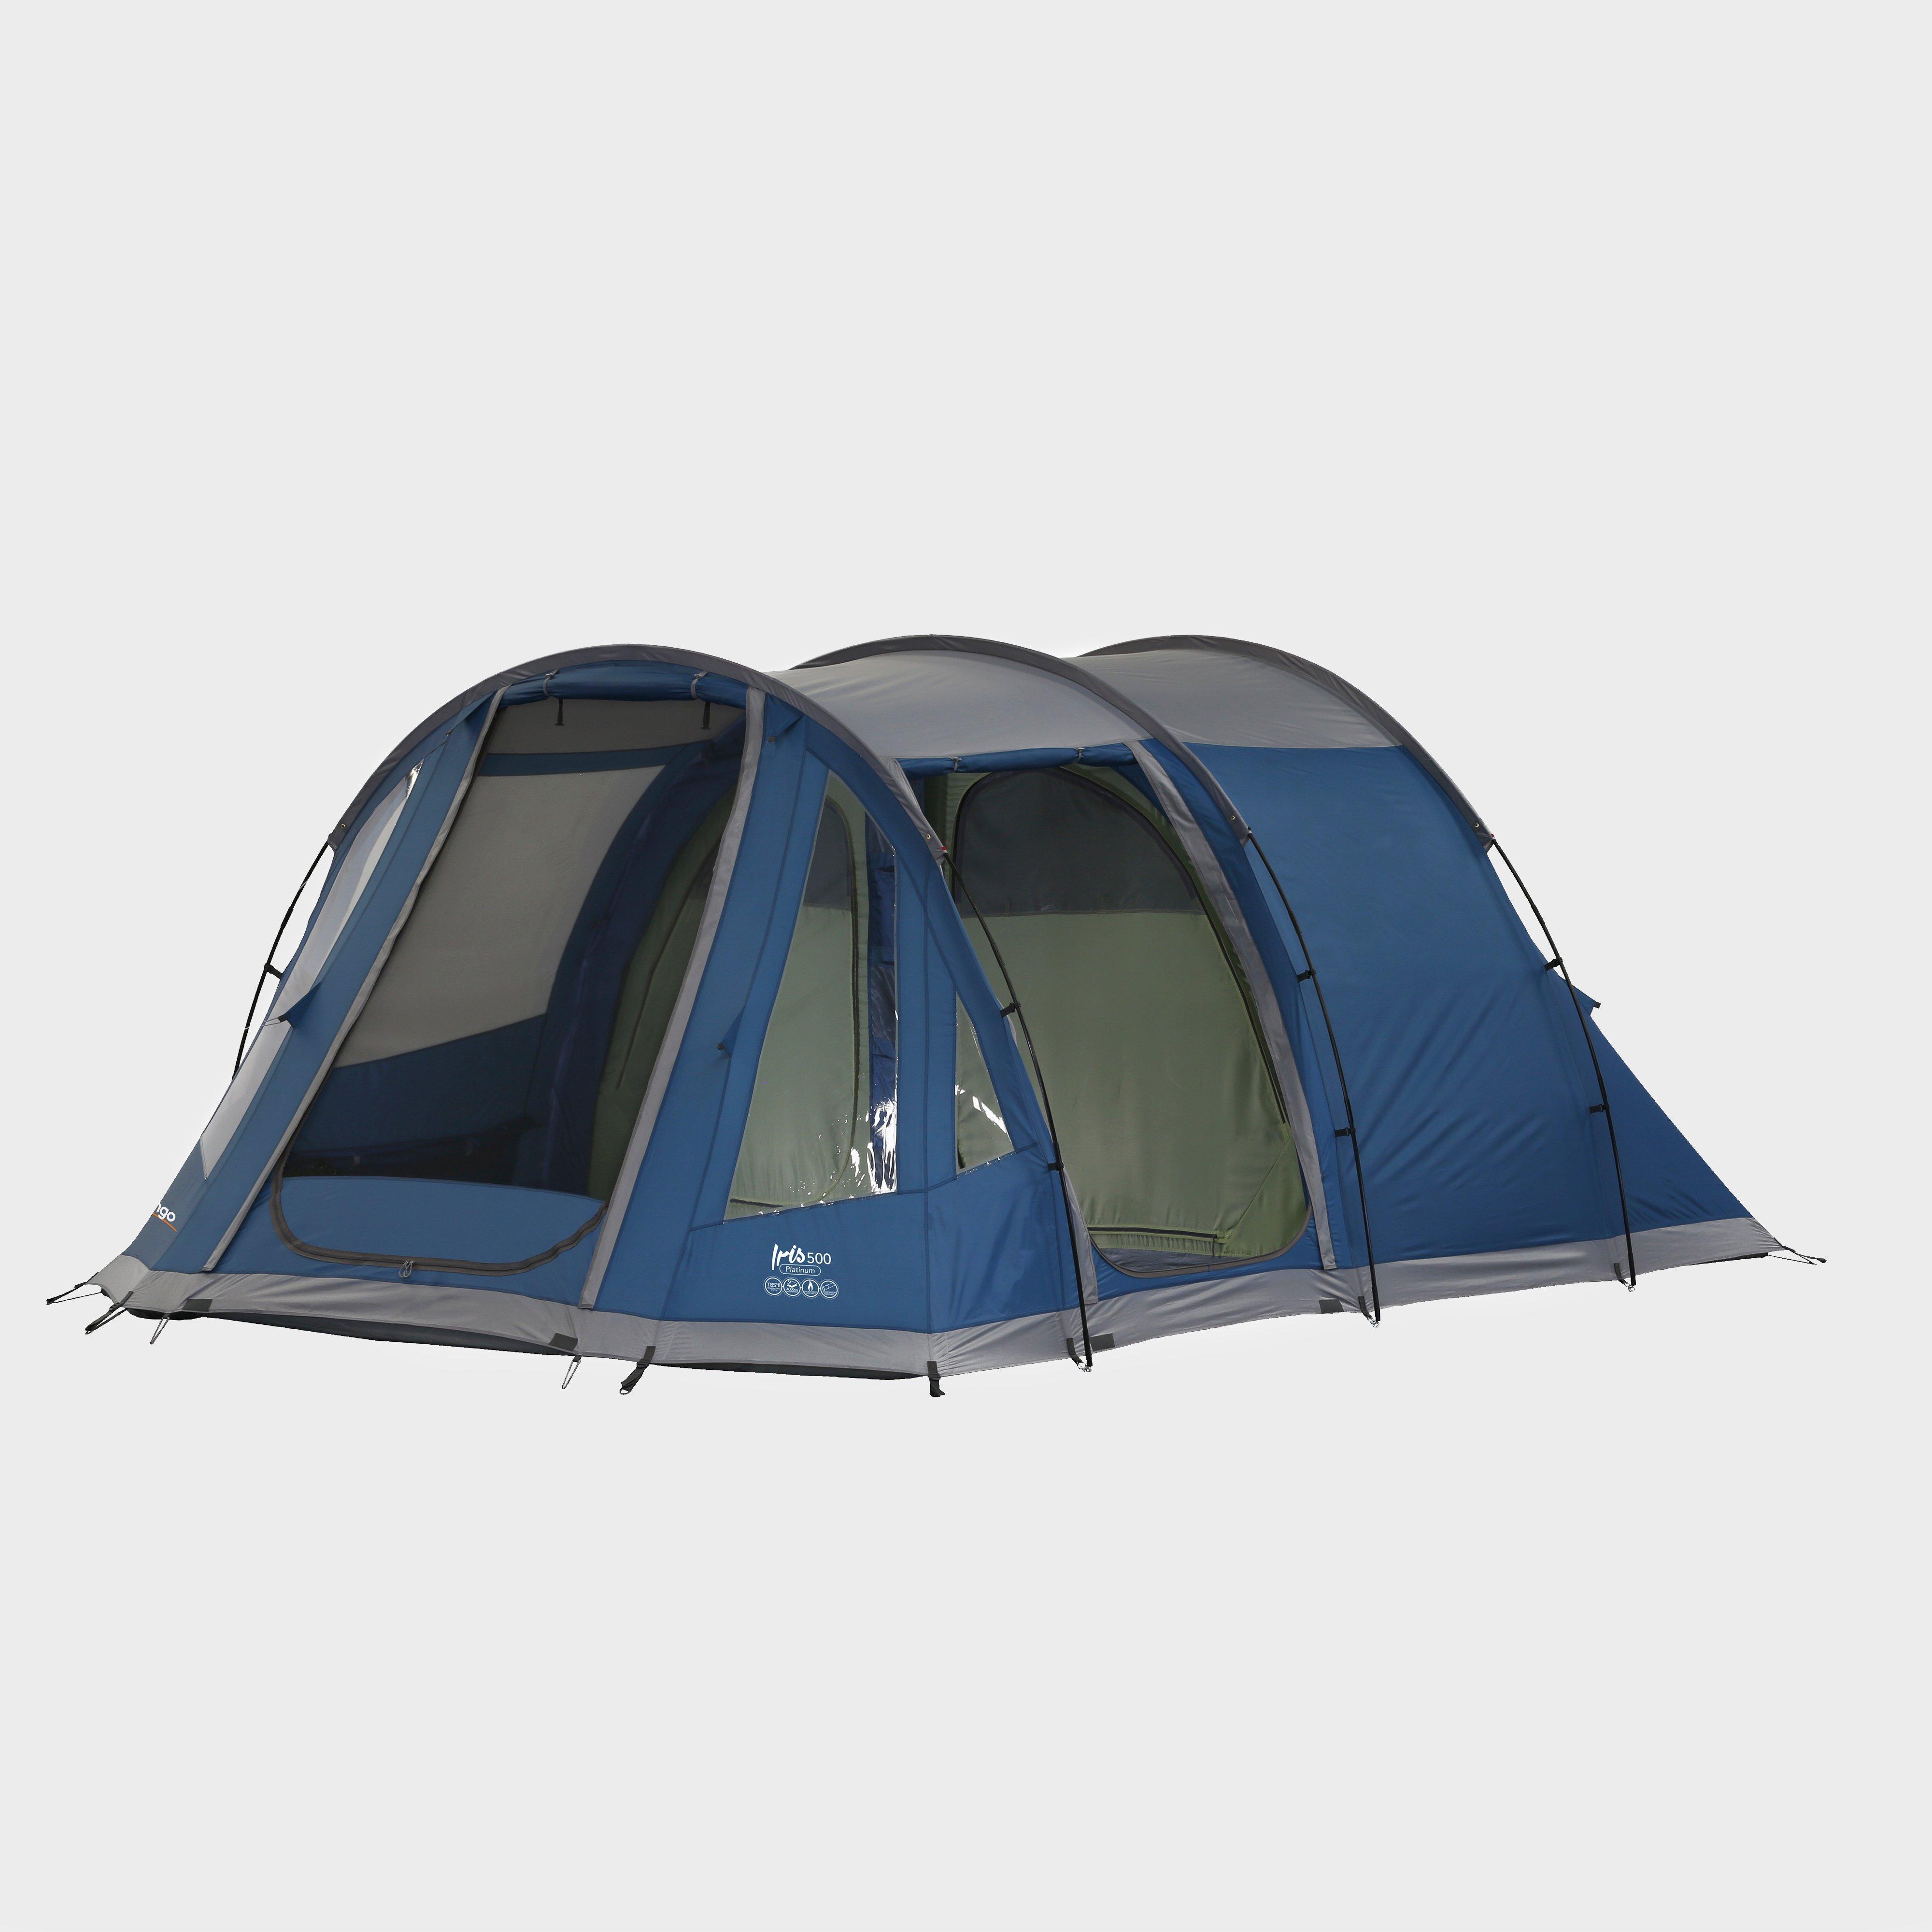 cheap tents \u0026 camping equipment sale milletsblue vango iris 500 family tent